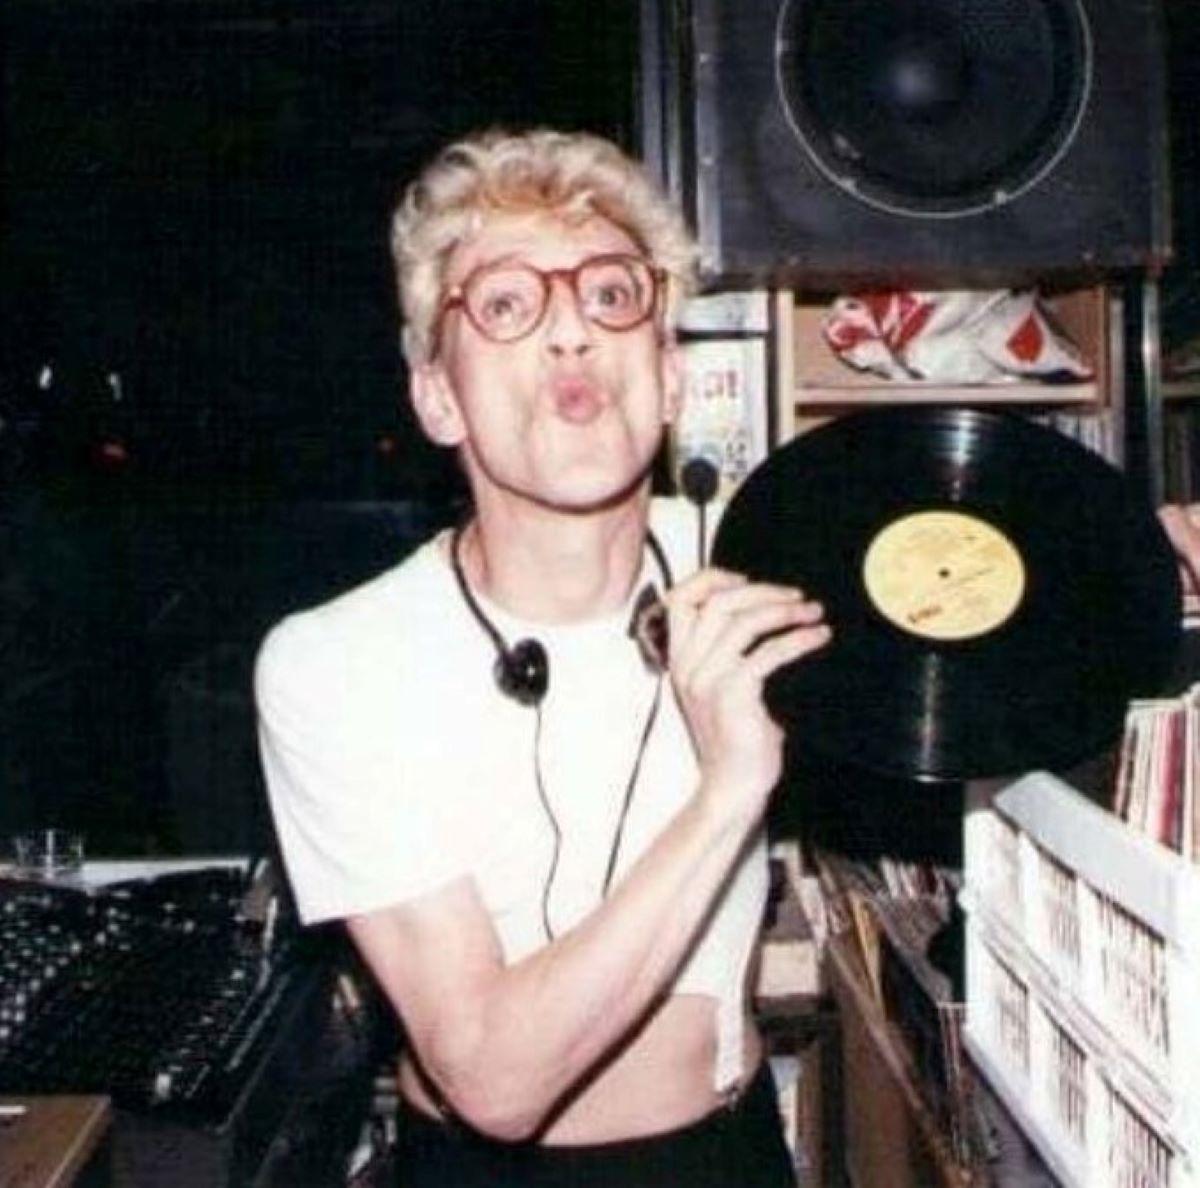 Lutto Musica Italiana Morto Jackmaster Pez DJ